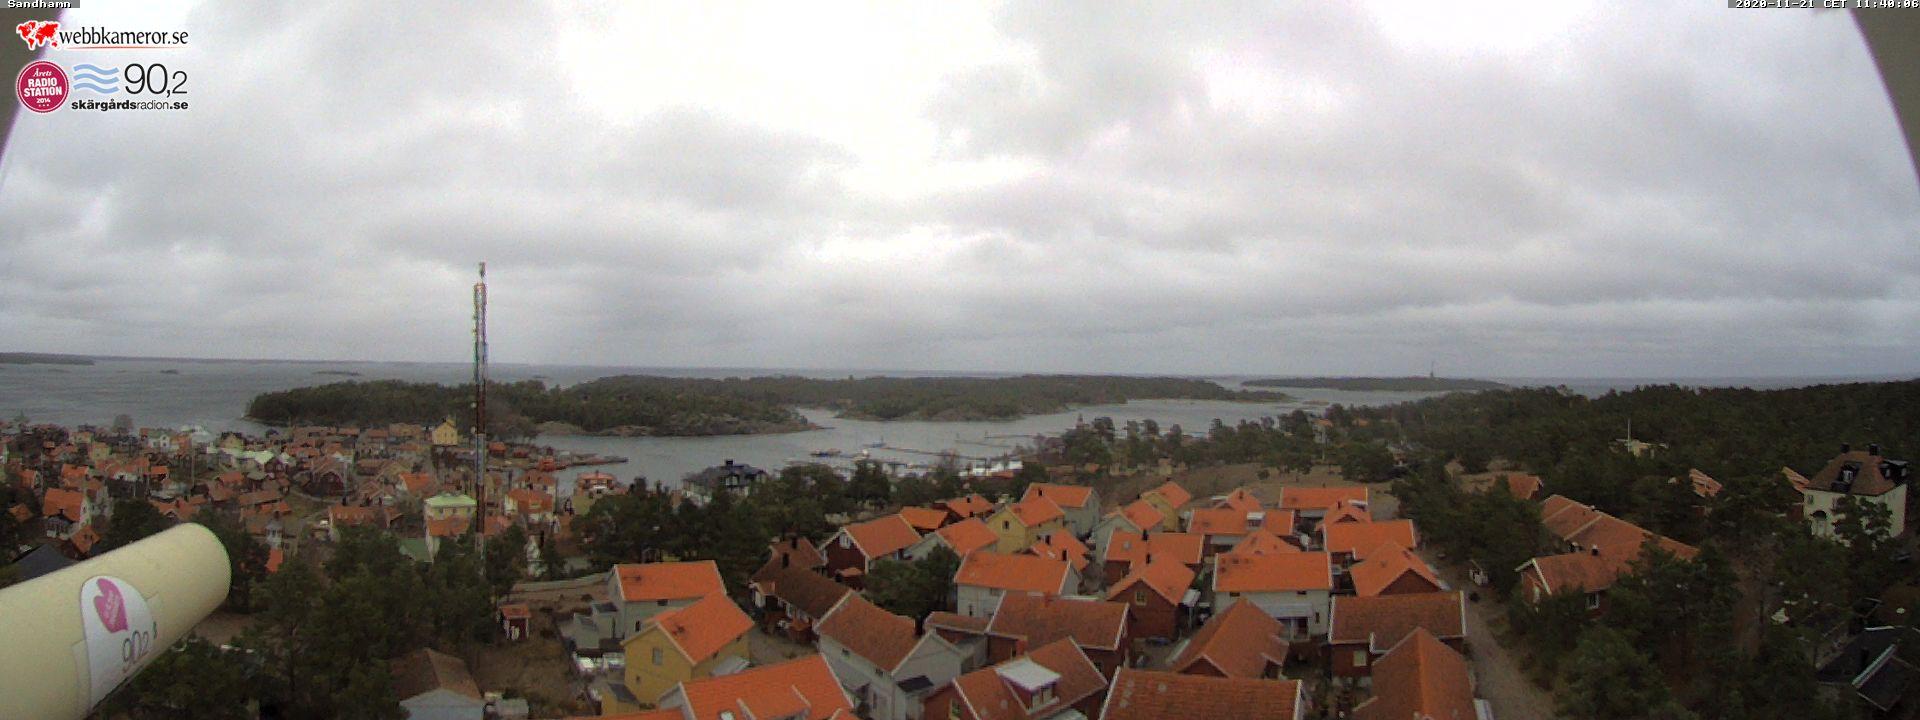 Webbkamera - Sandhamn